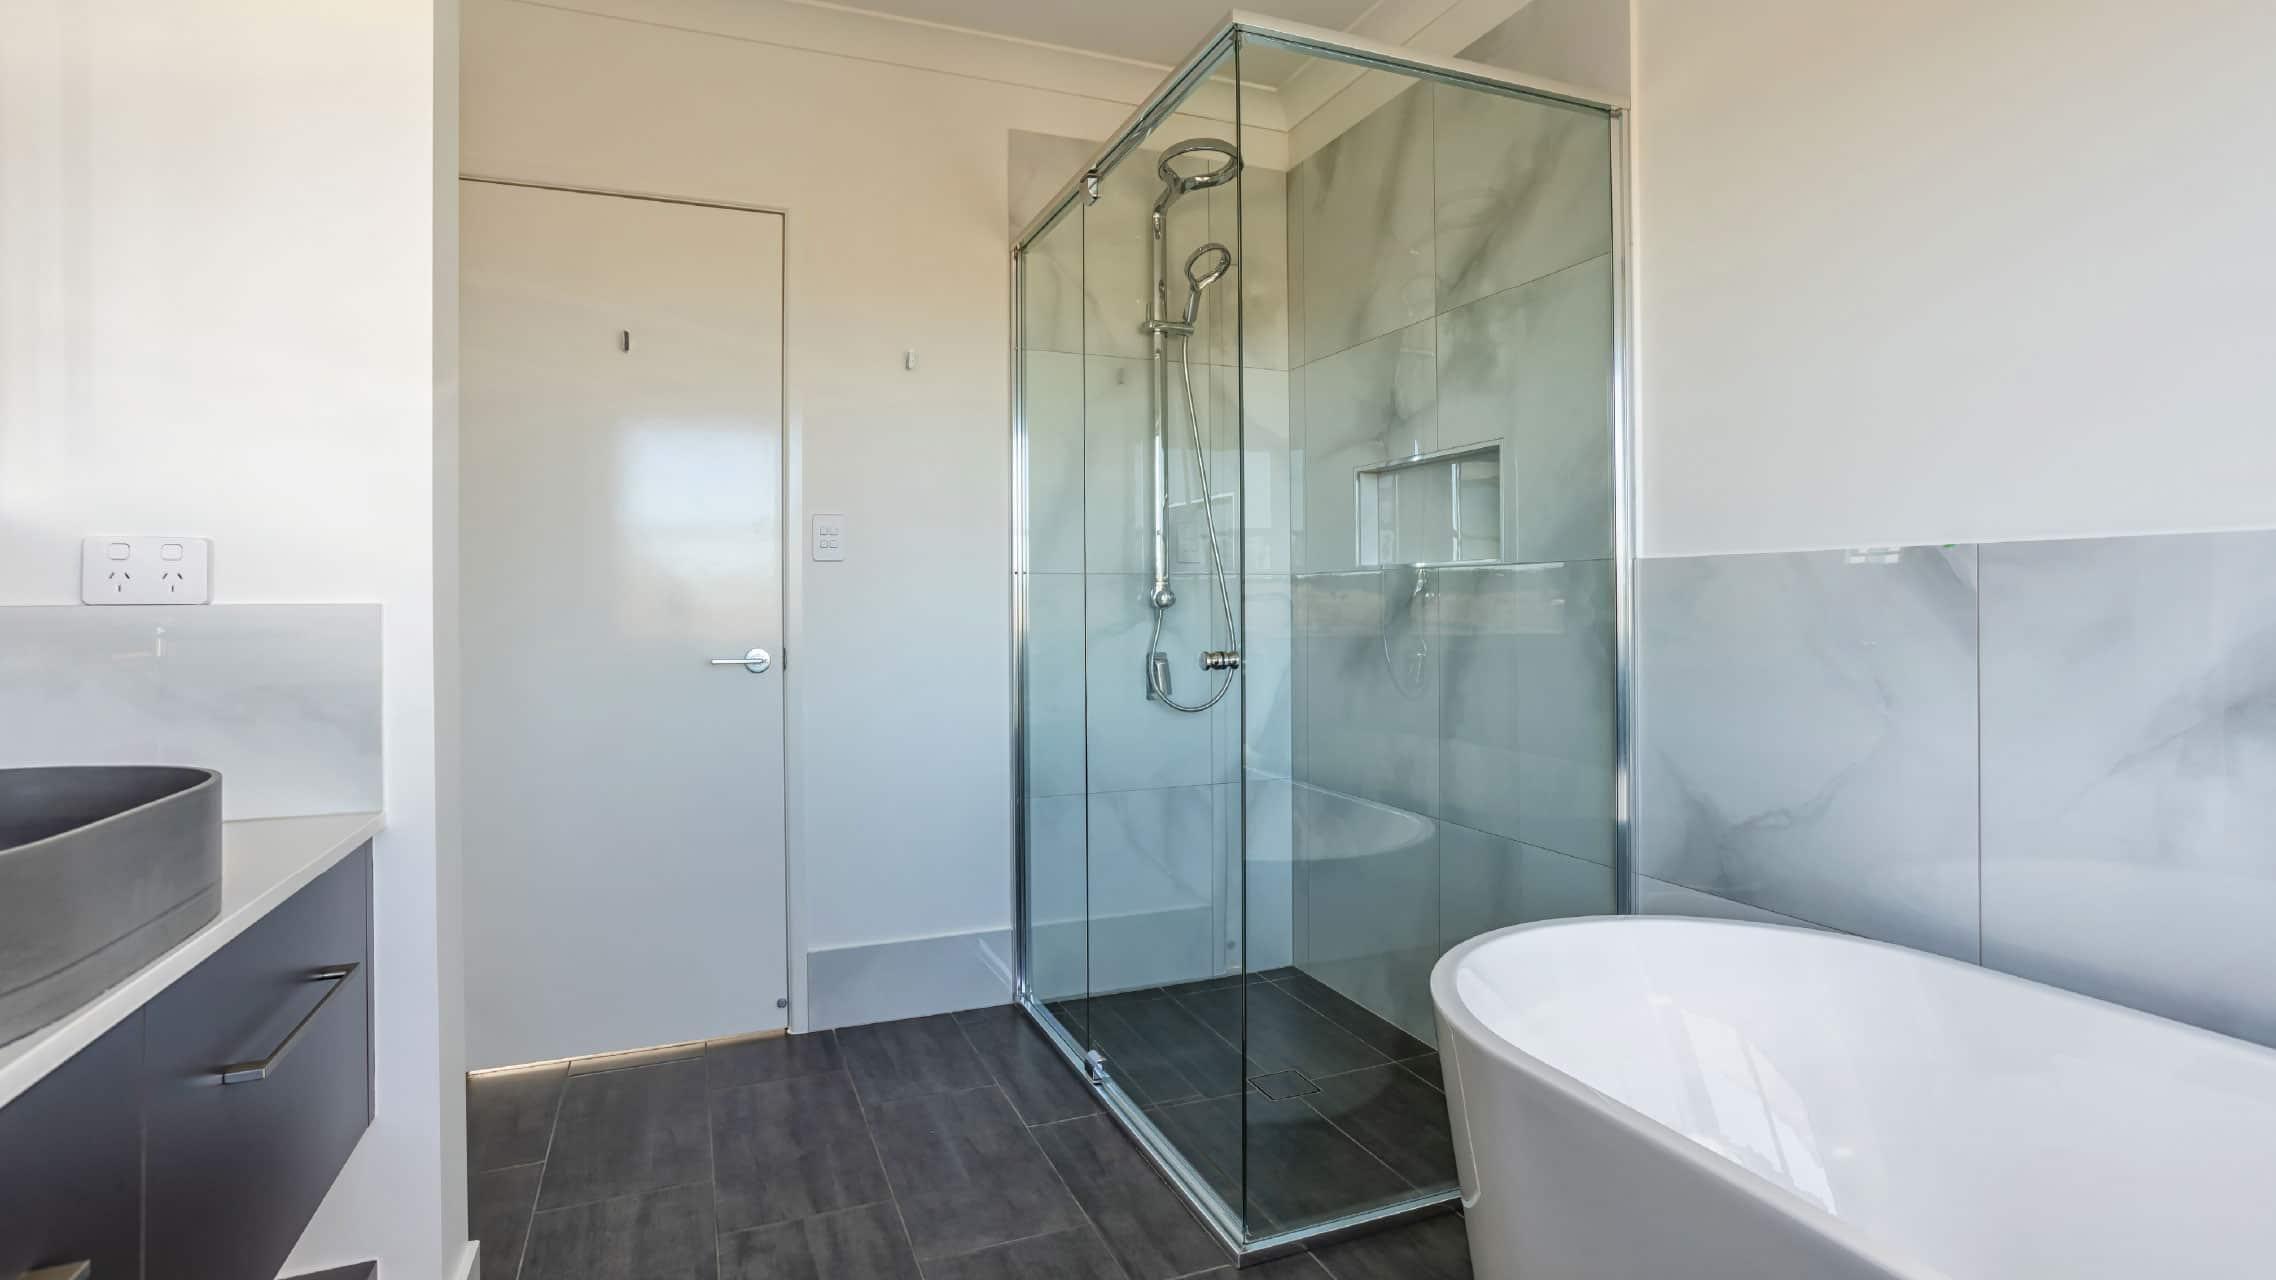 Semi Frameless Showerscreen in a bathroom